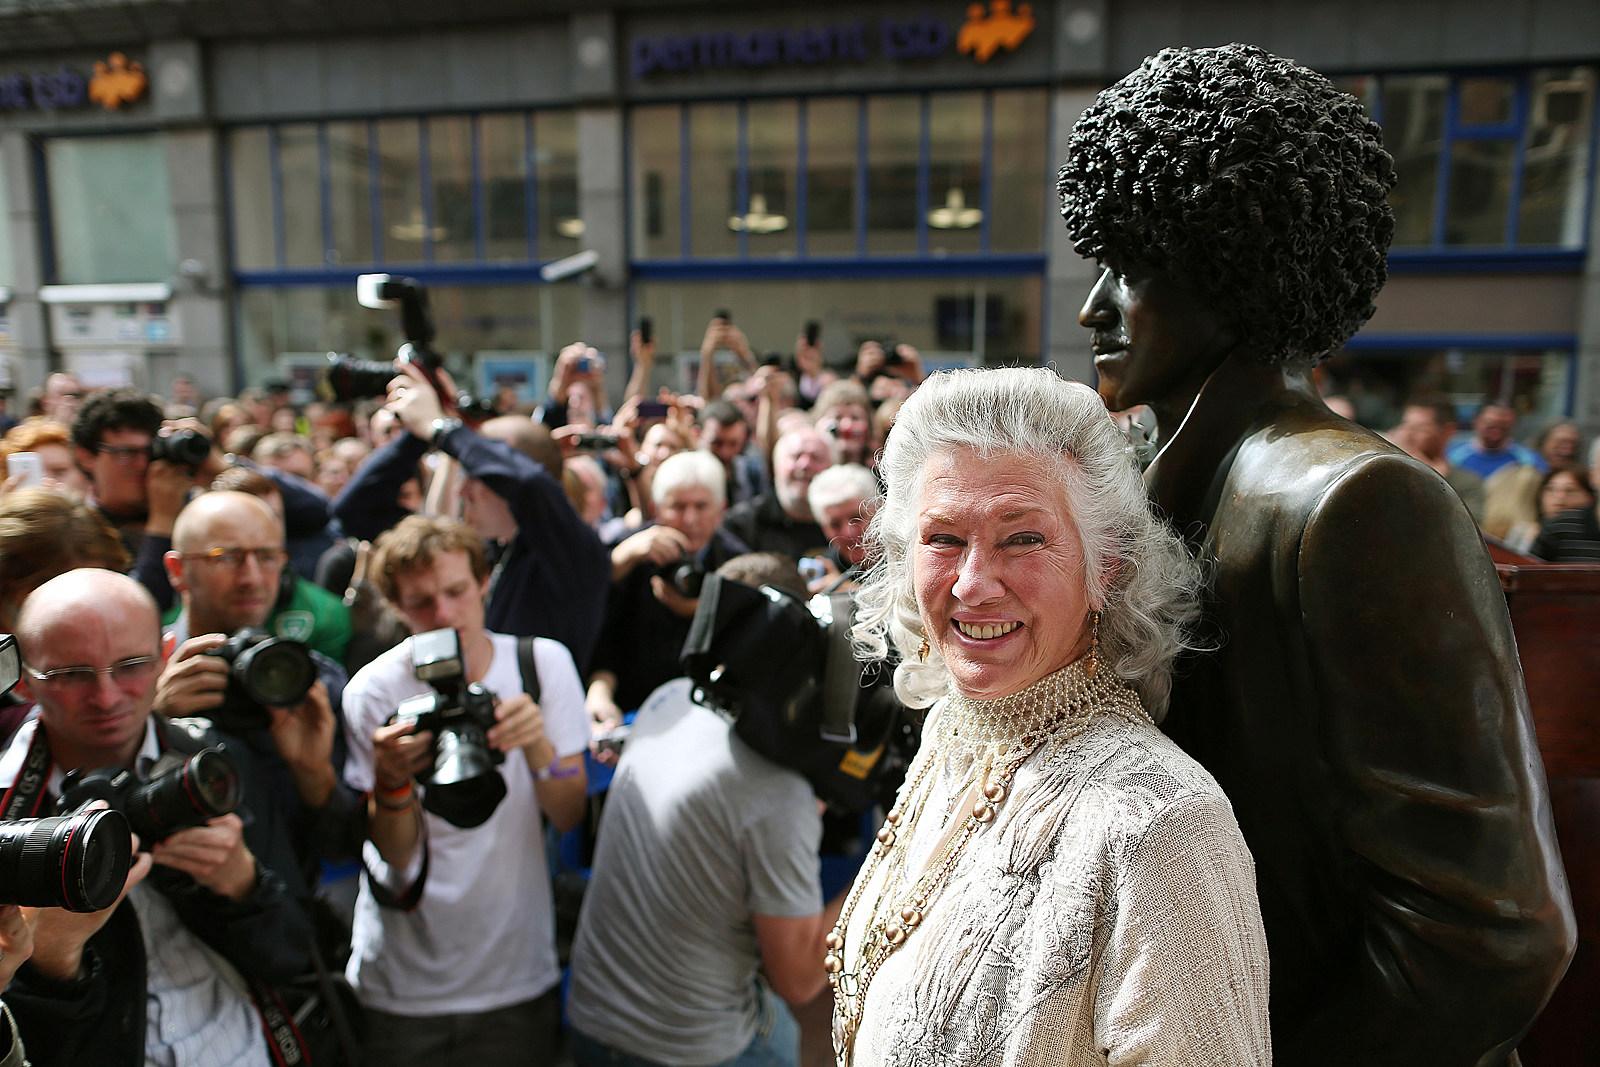 Remembering Philomena Lynott, the Queen of Irish Rock 'n' Roll